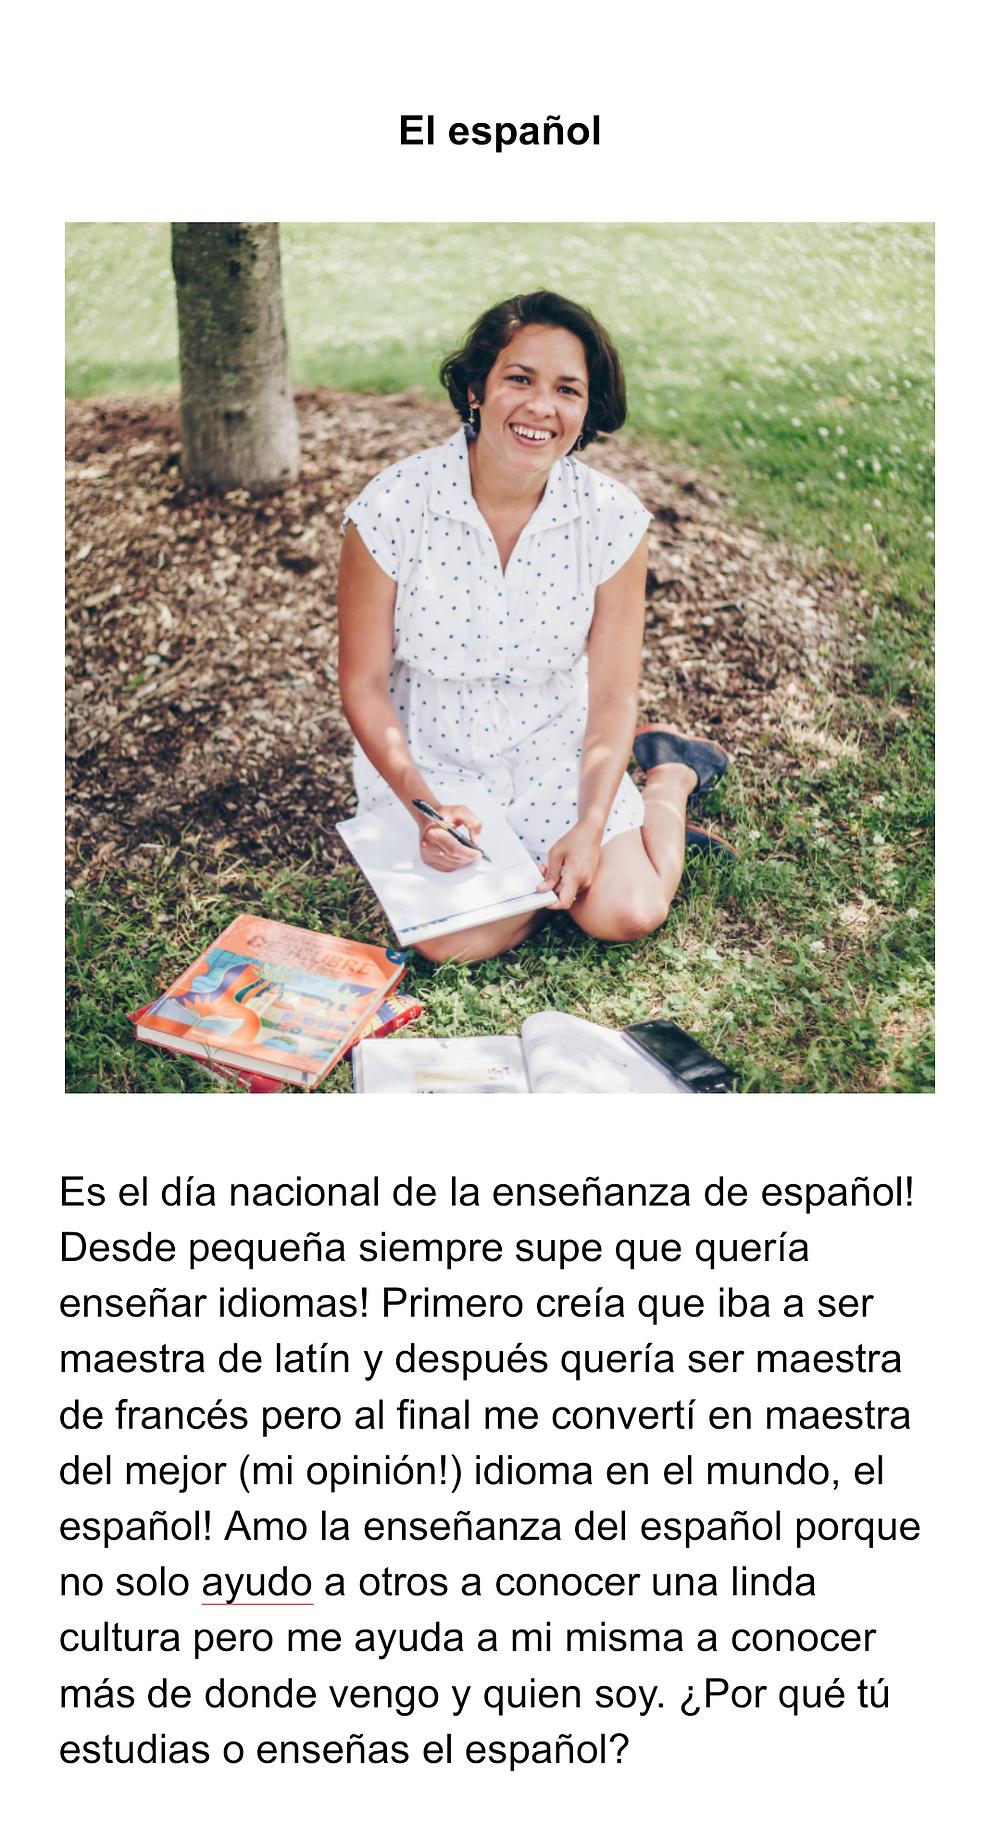 espanol, national spanish teaching day, the language movement, weekly reading guides, spanish readings, spanish practice, spanish resources, spanish comprehension, spanish online, spanish teacher